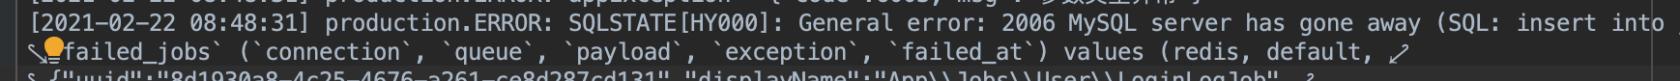 laravel队列执行一段时间会出现2006 MySQL server has gone away